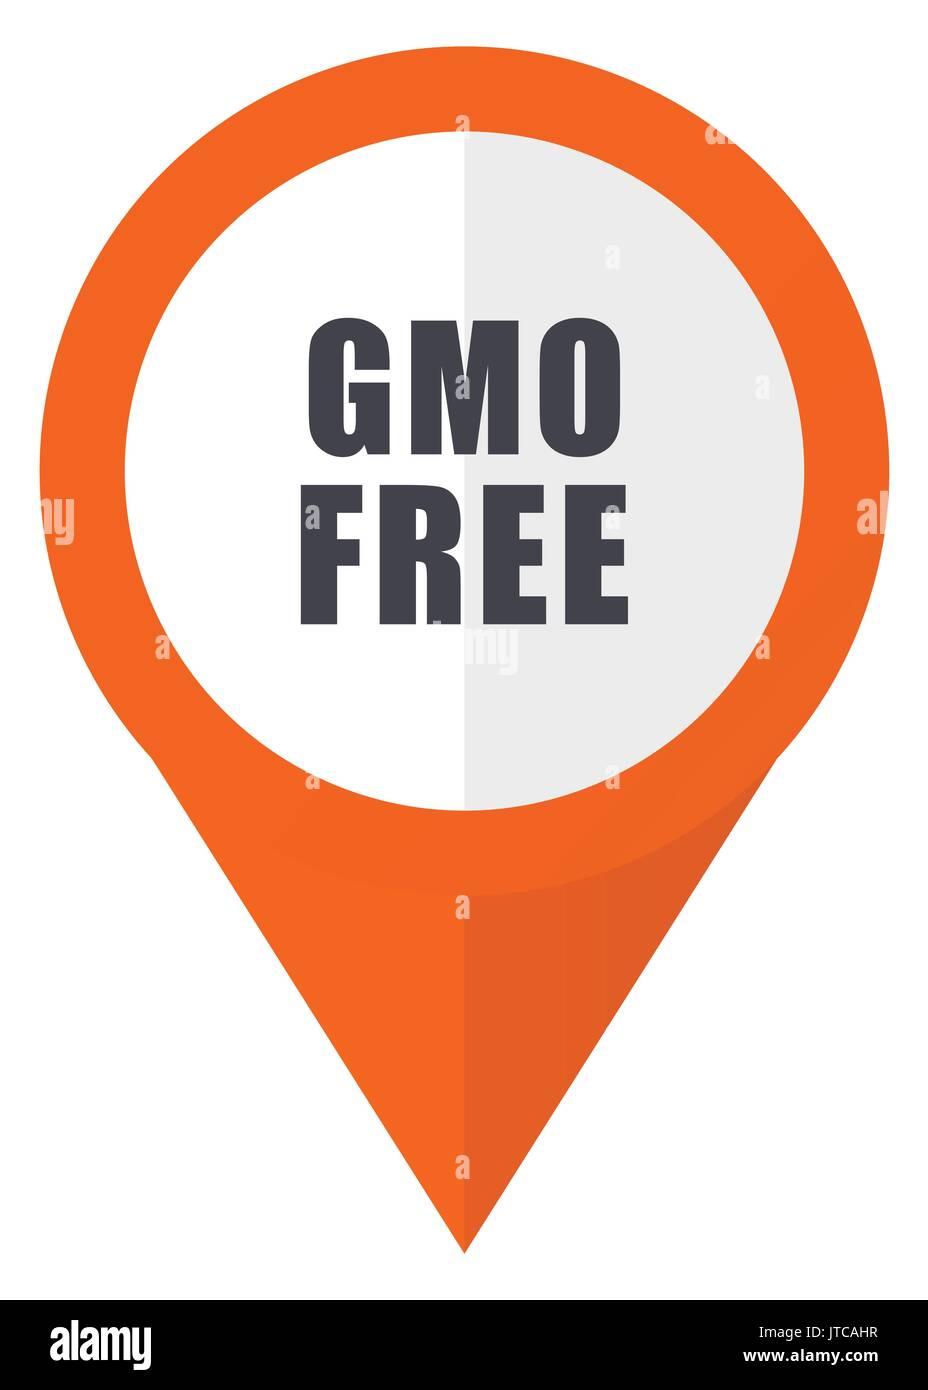 Gmo Free Corn Stock Photos Gmo Free Corn Stock Images Alamy